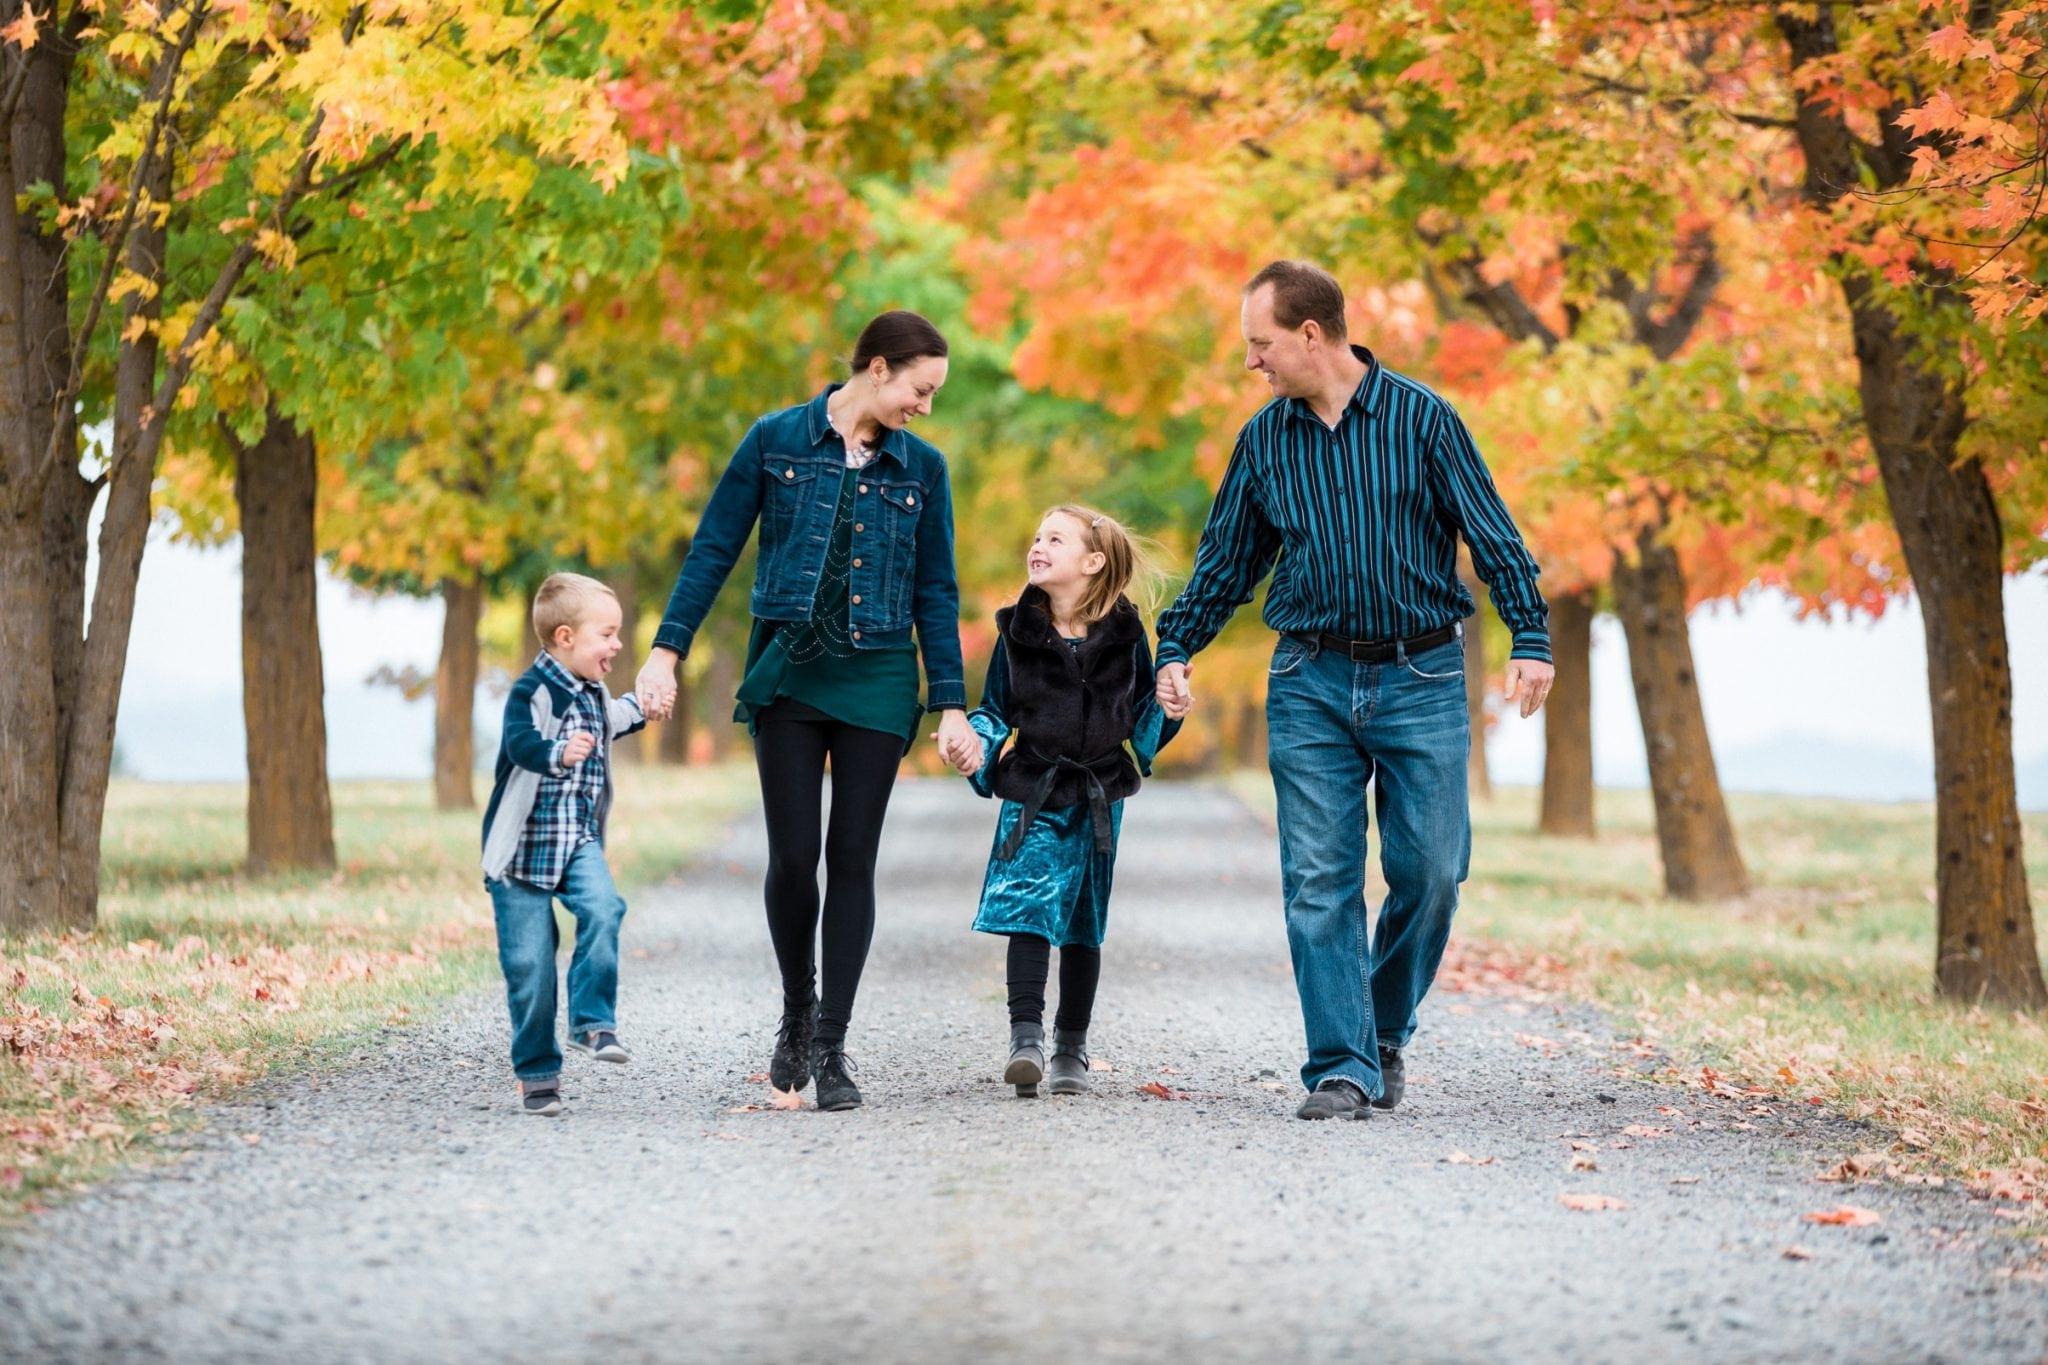 Fall family photo in Spokane WA taken by Franklin Photography